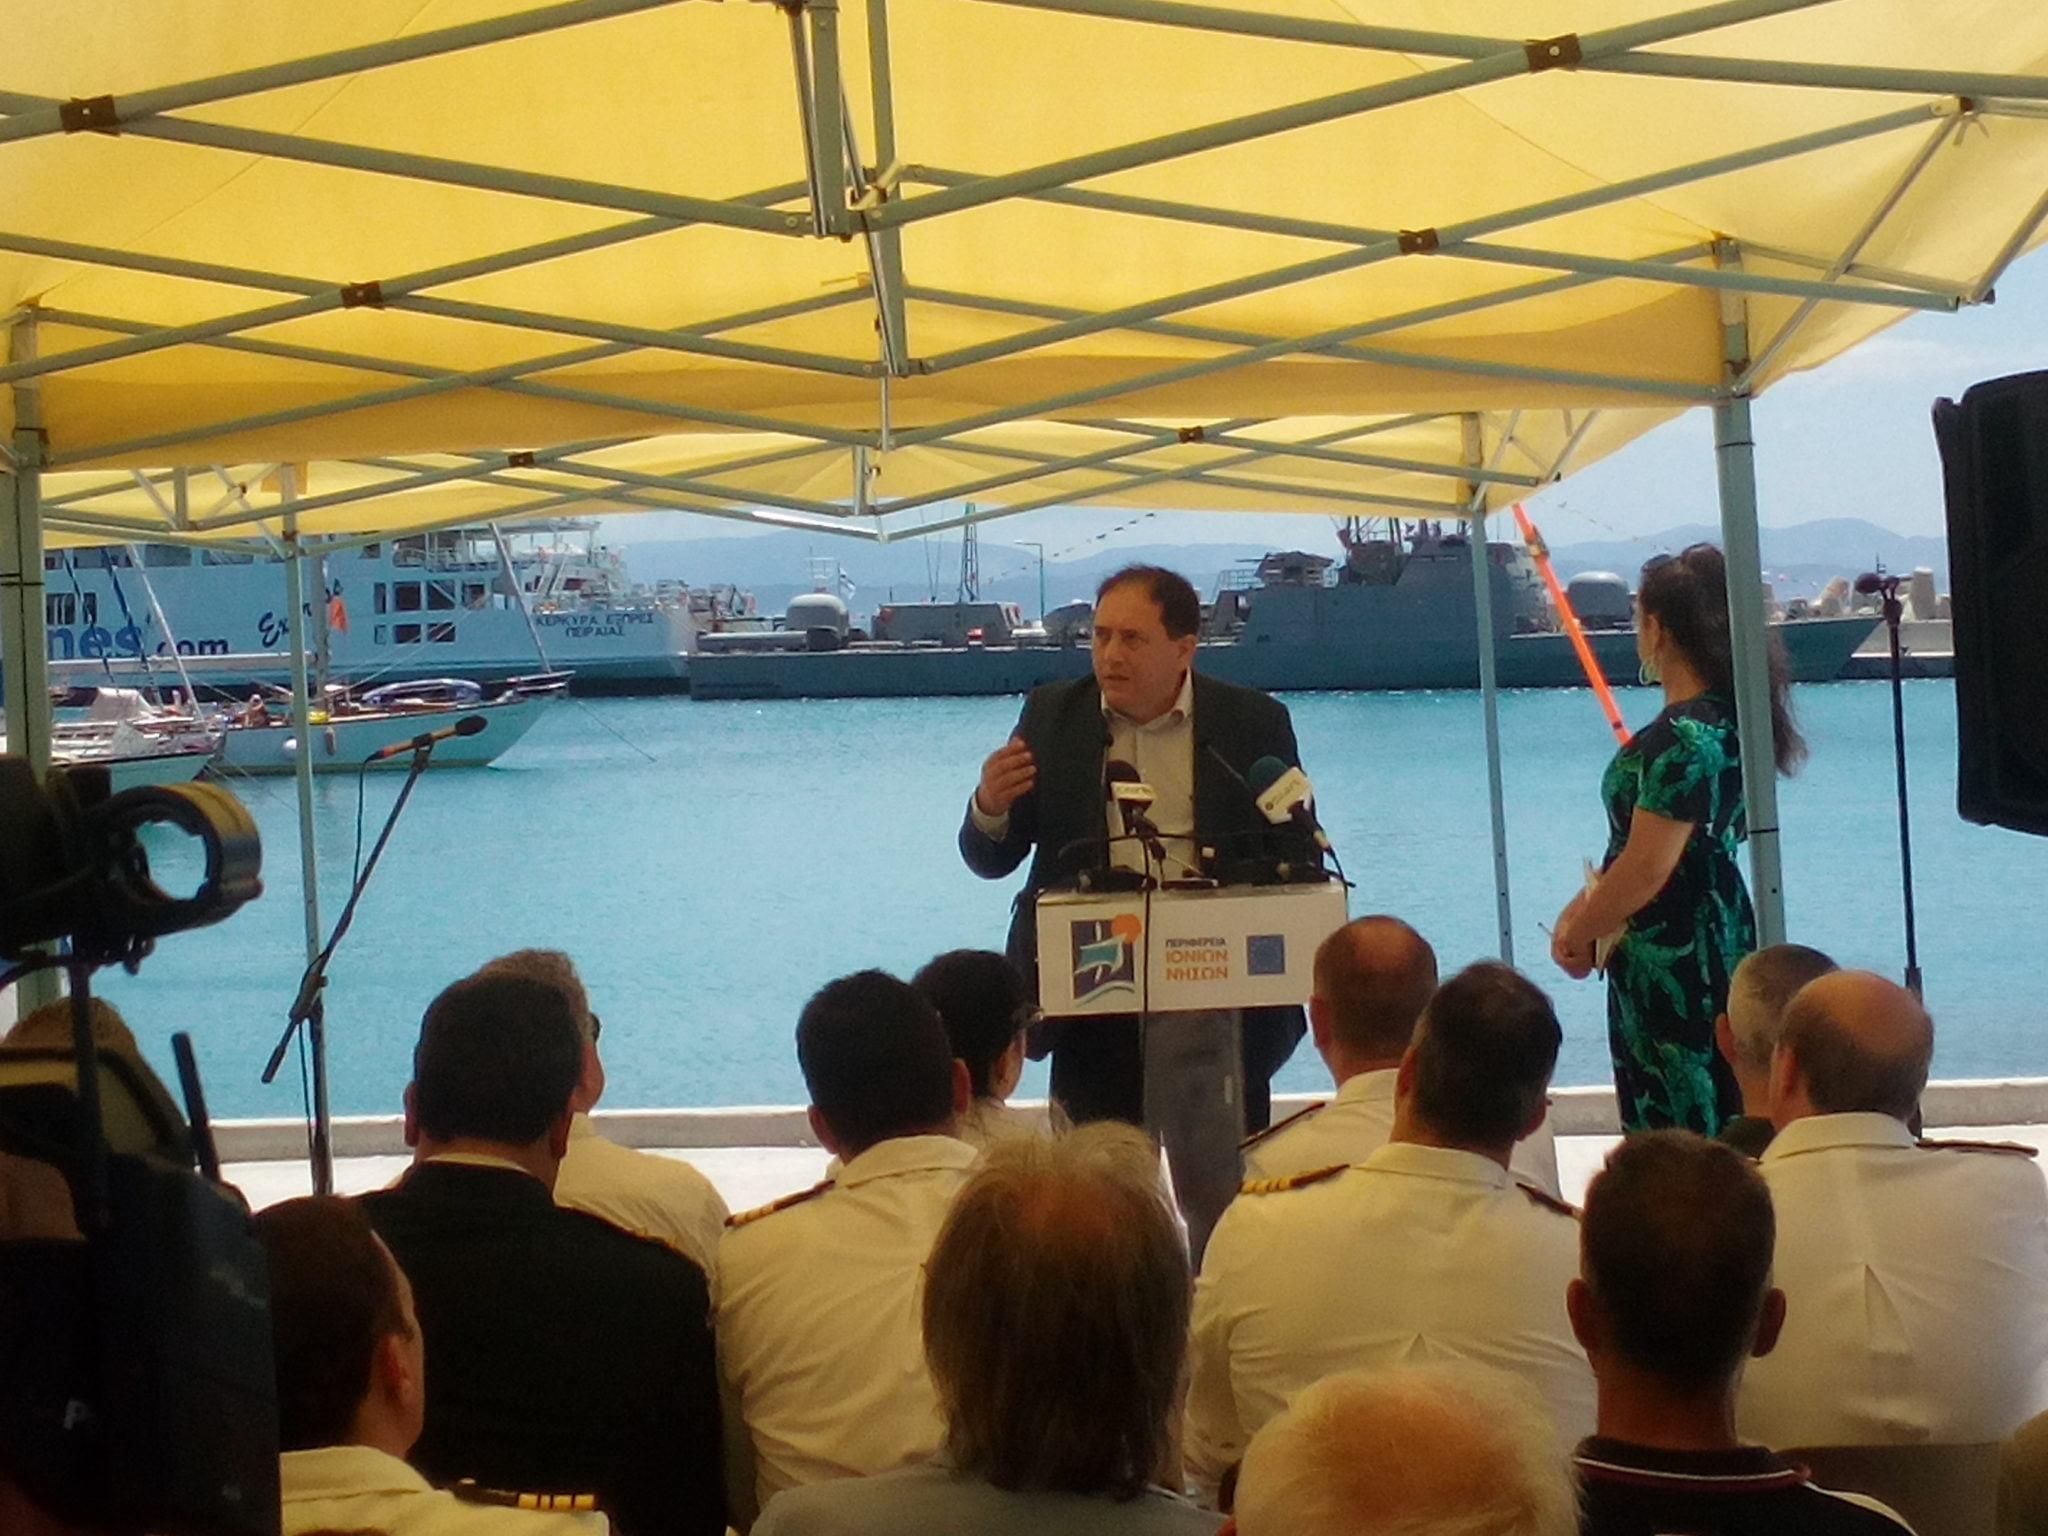 Photo of Στην ζωή μας και στο δρομο μας το νεο λιμάνι της Ερείκουσας…Ολοκληρώθηκαν τα εγκαινια.